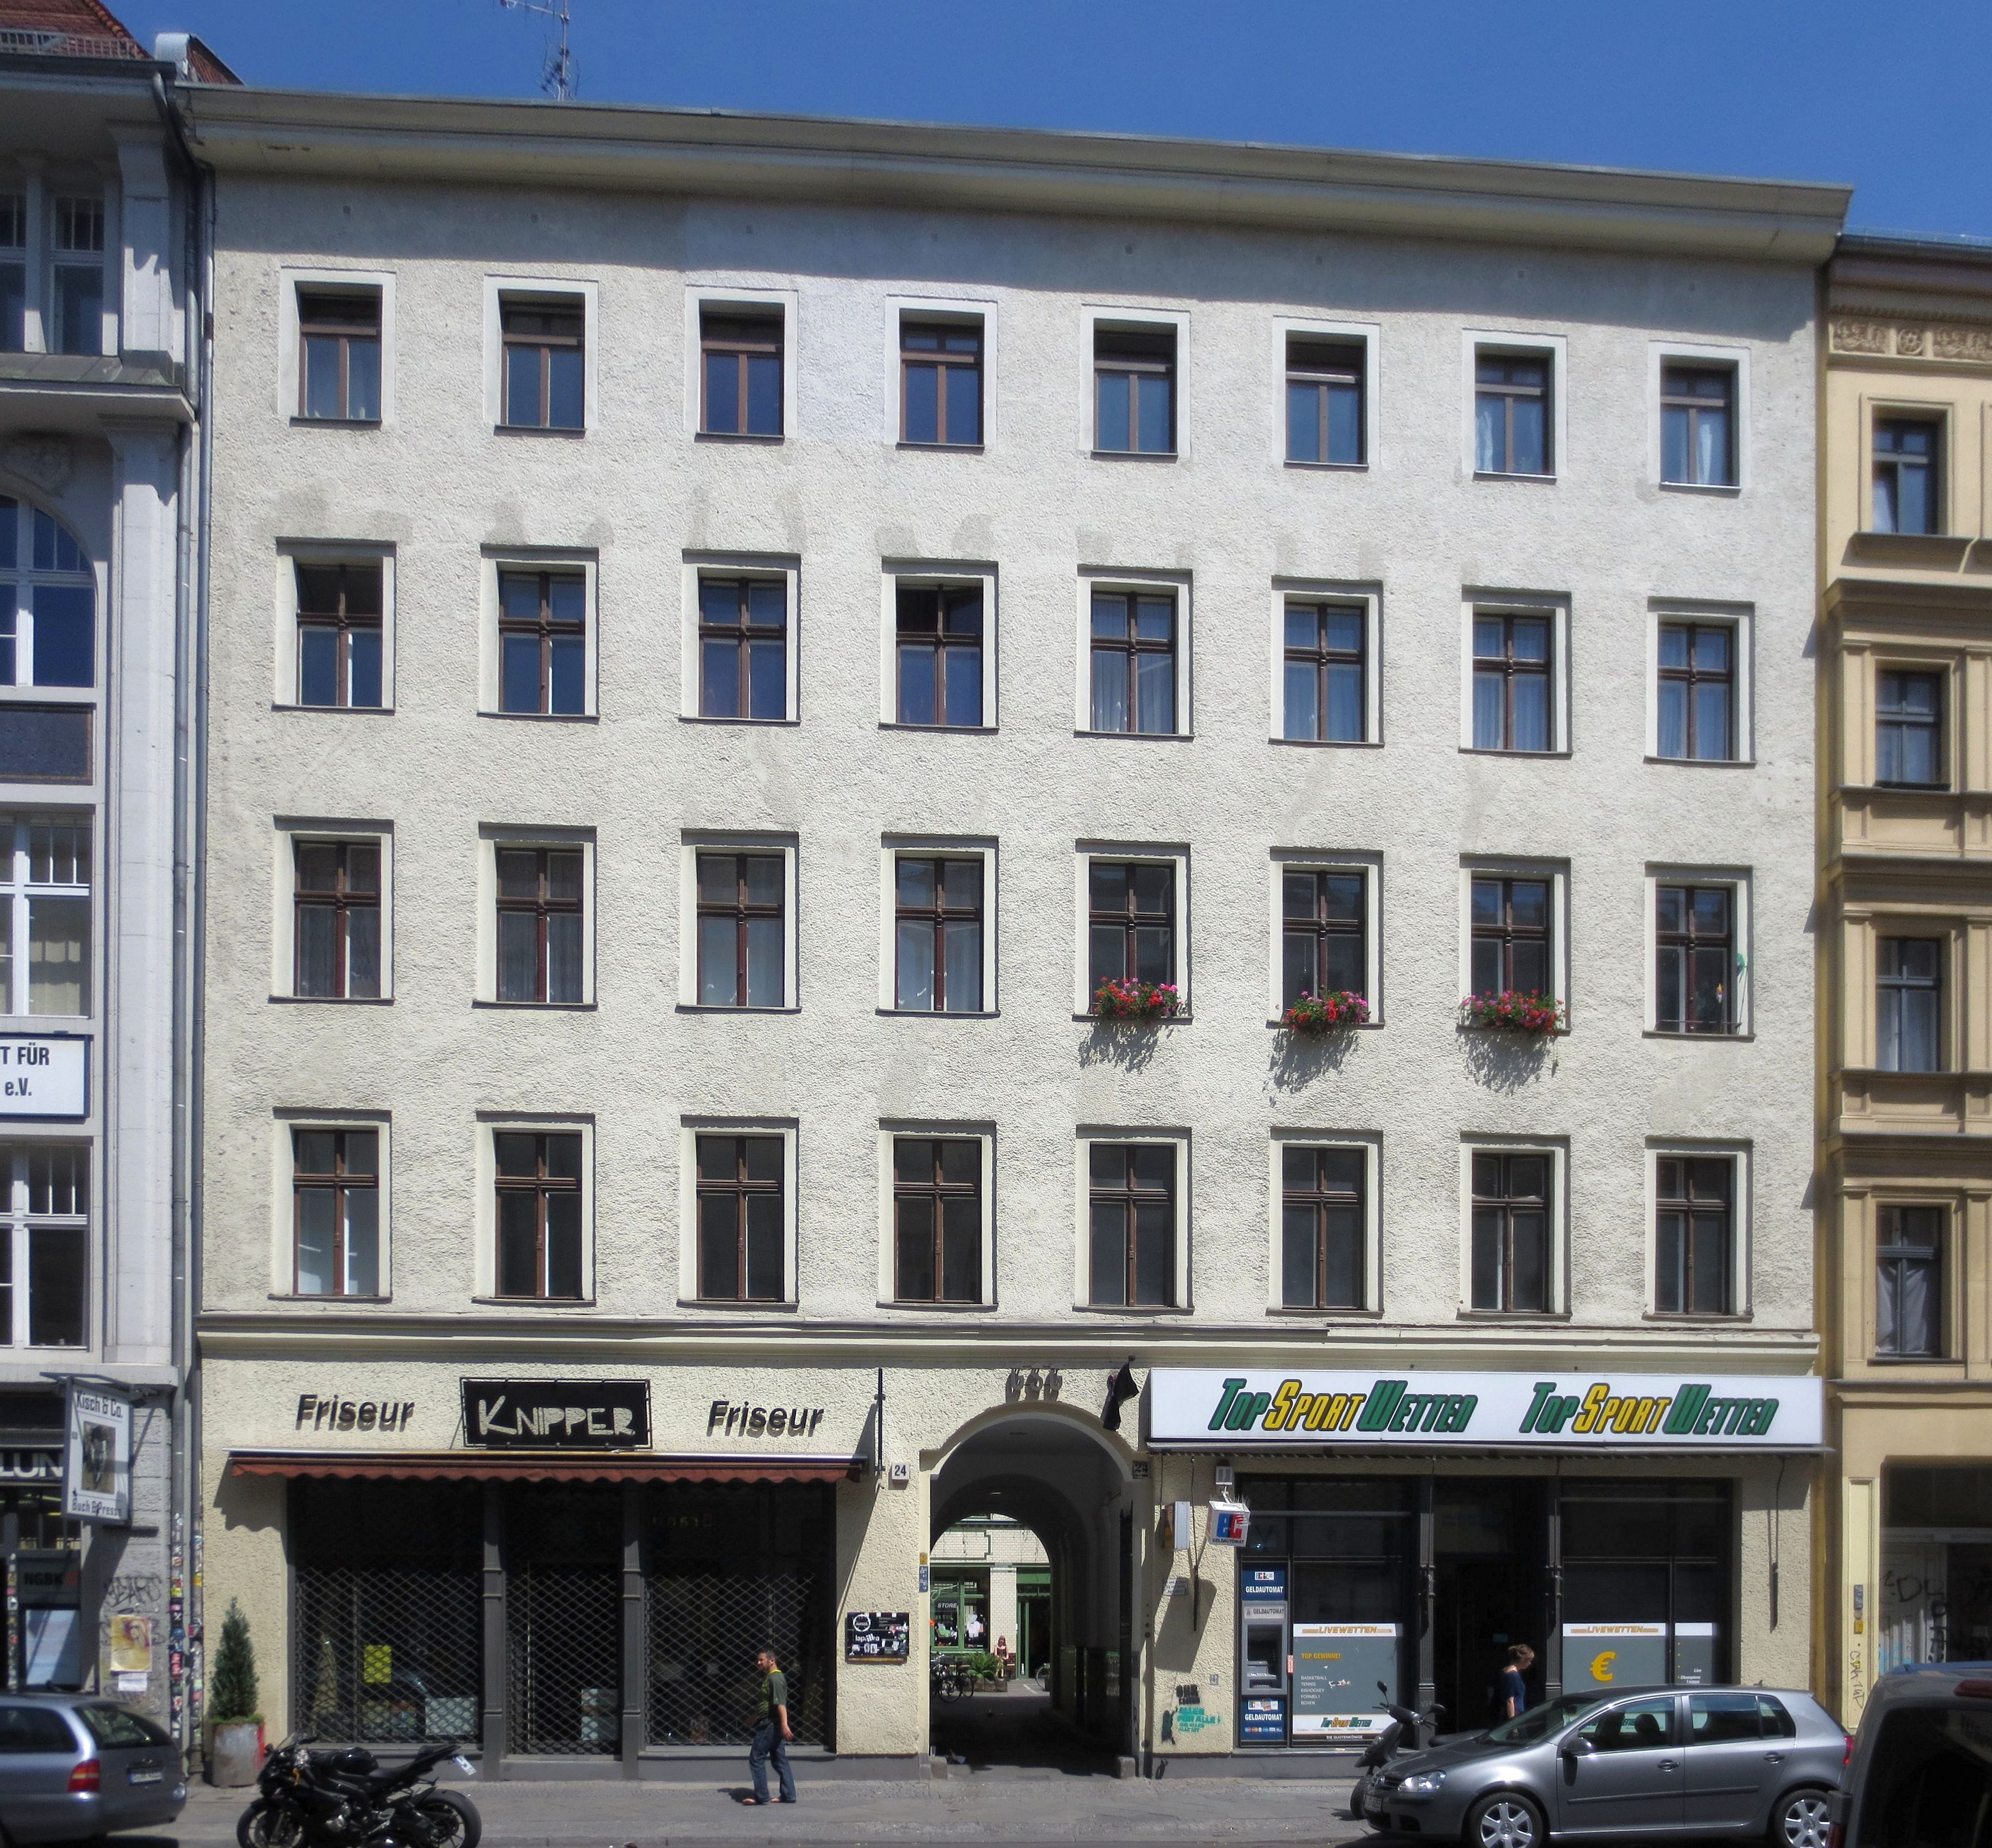 Friseur Berlin Kreuzberg  Friseur